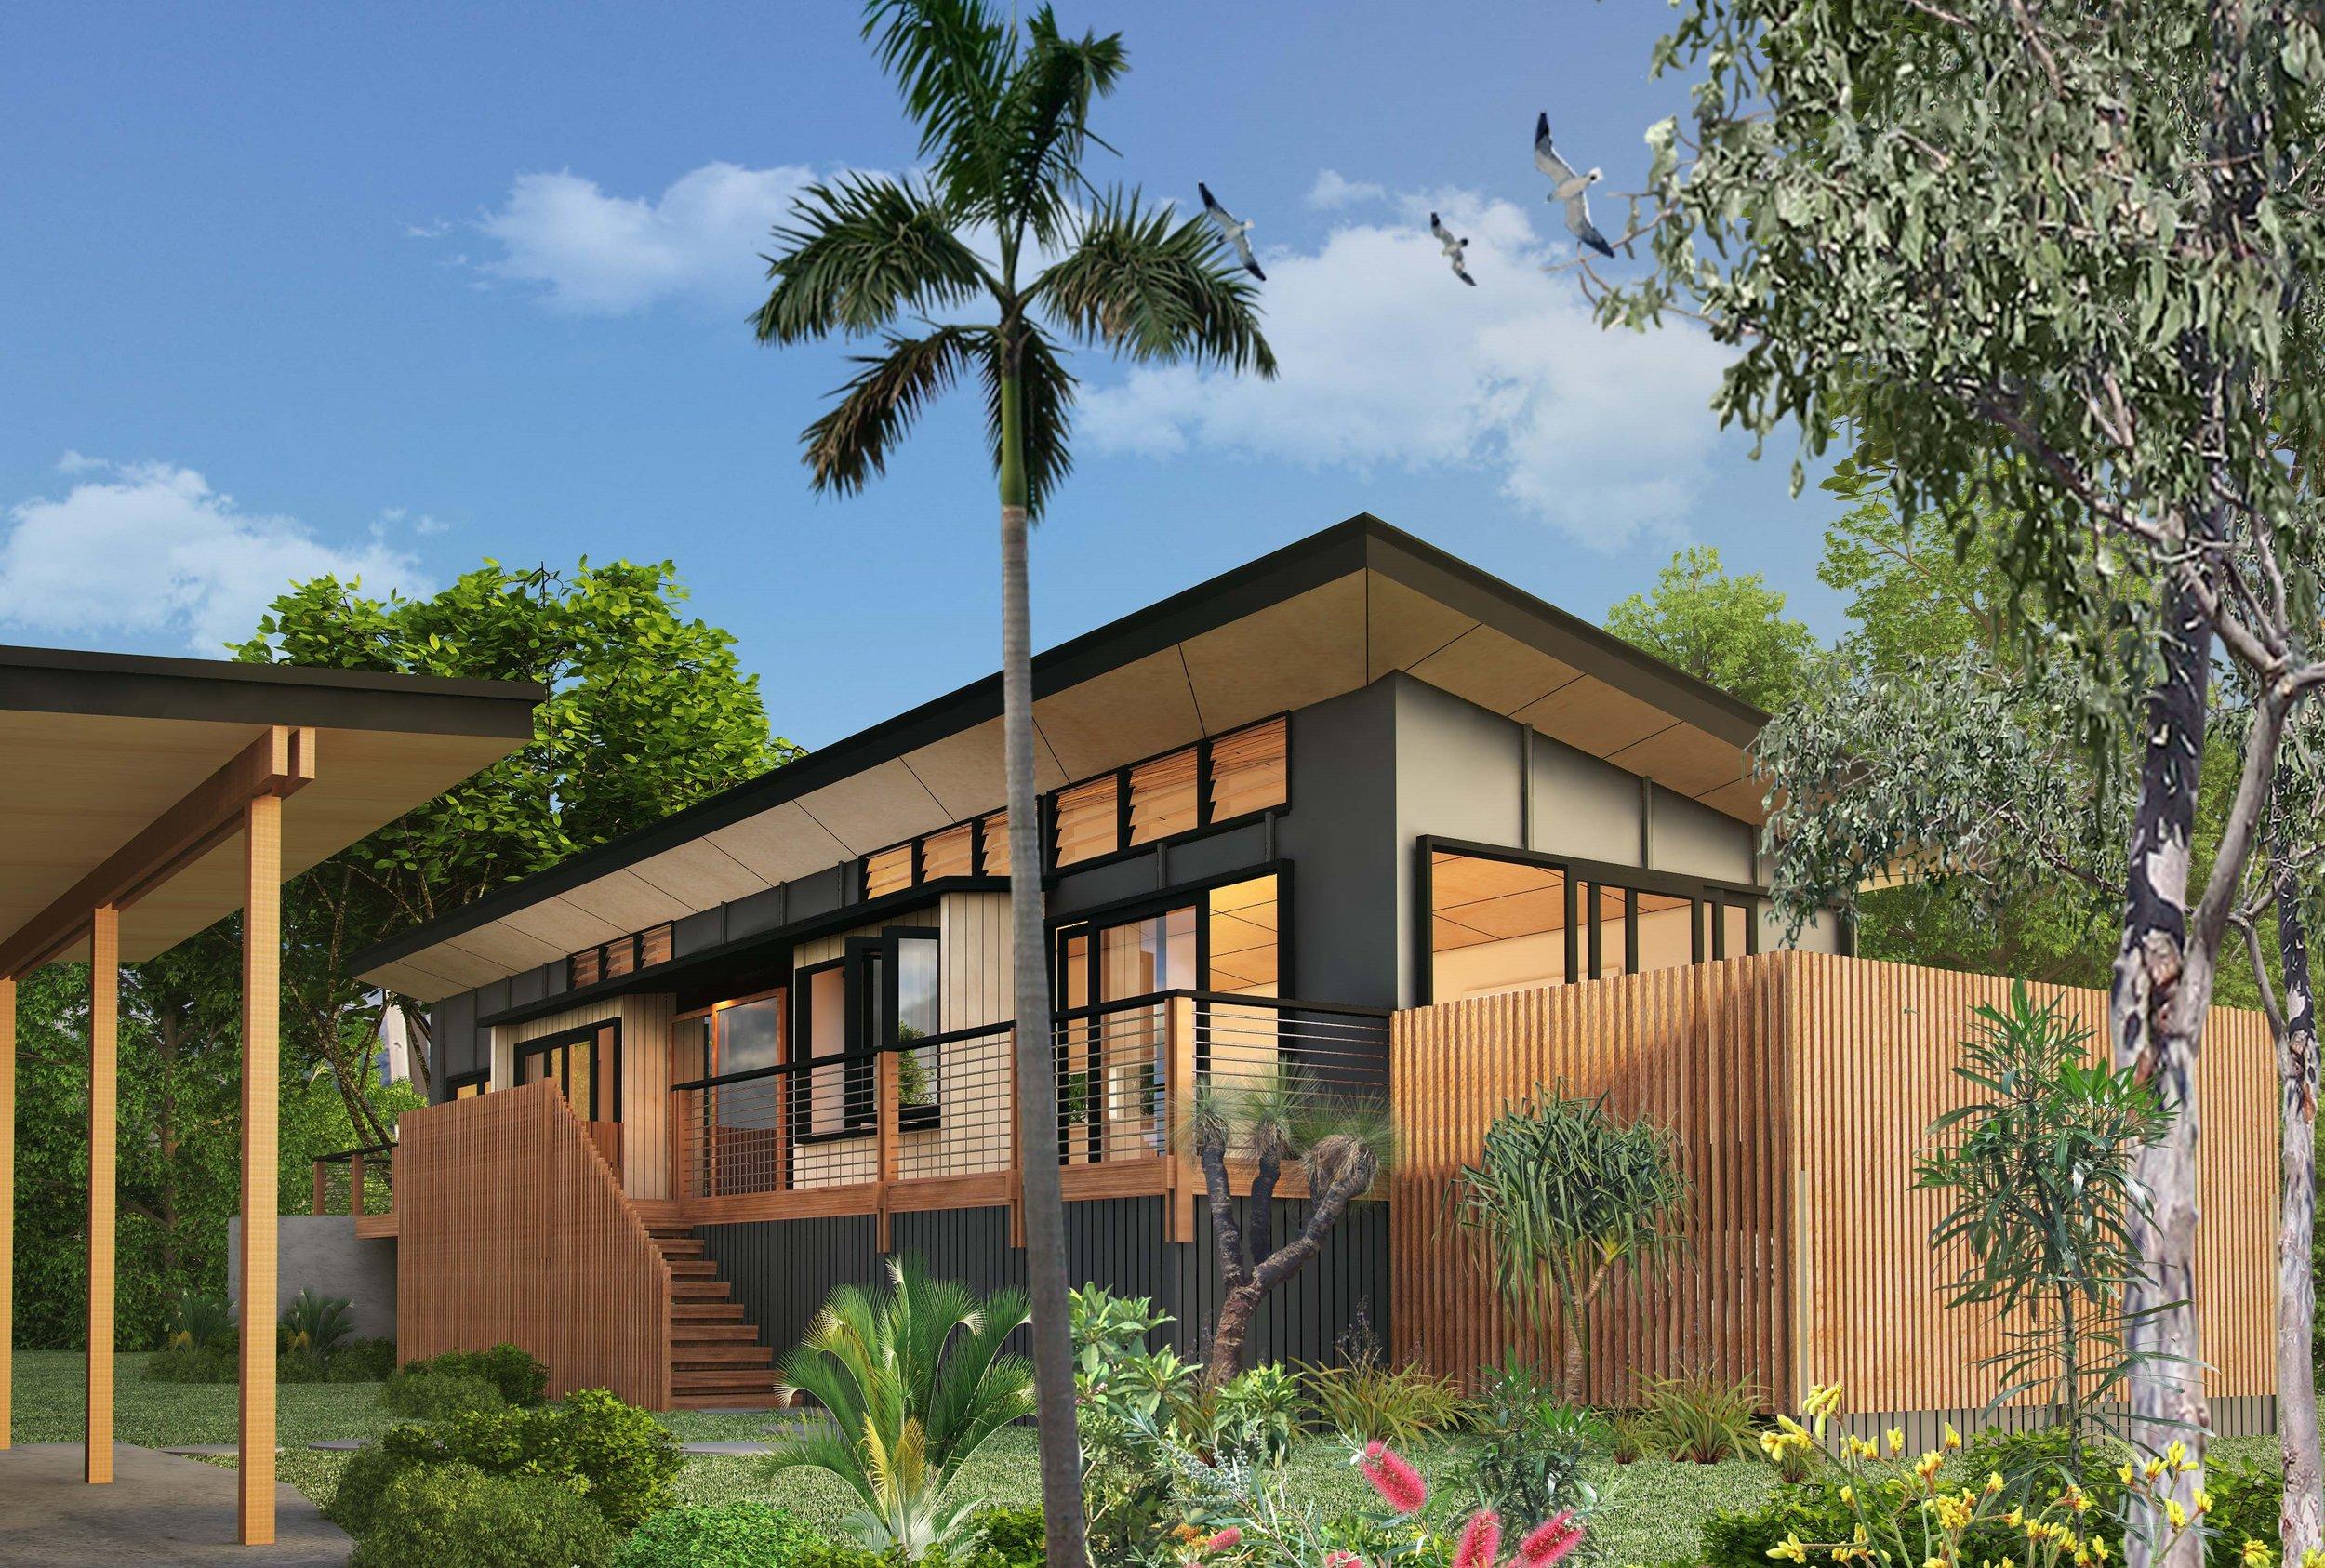 Billy house design